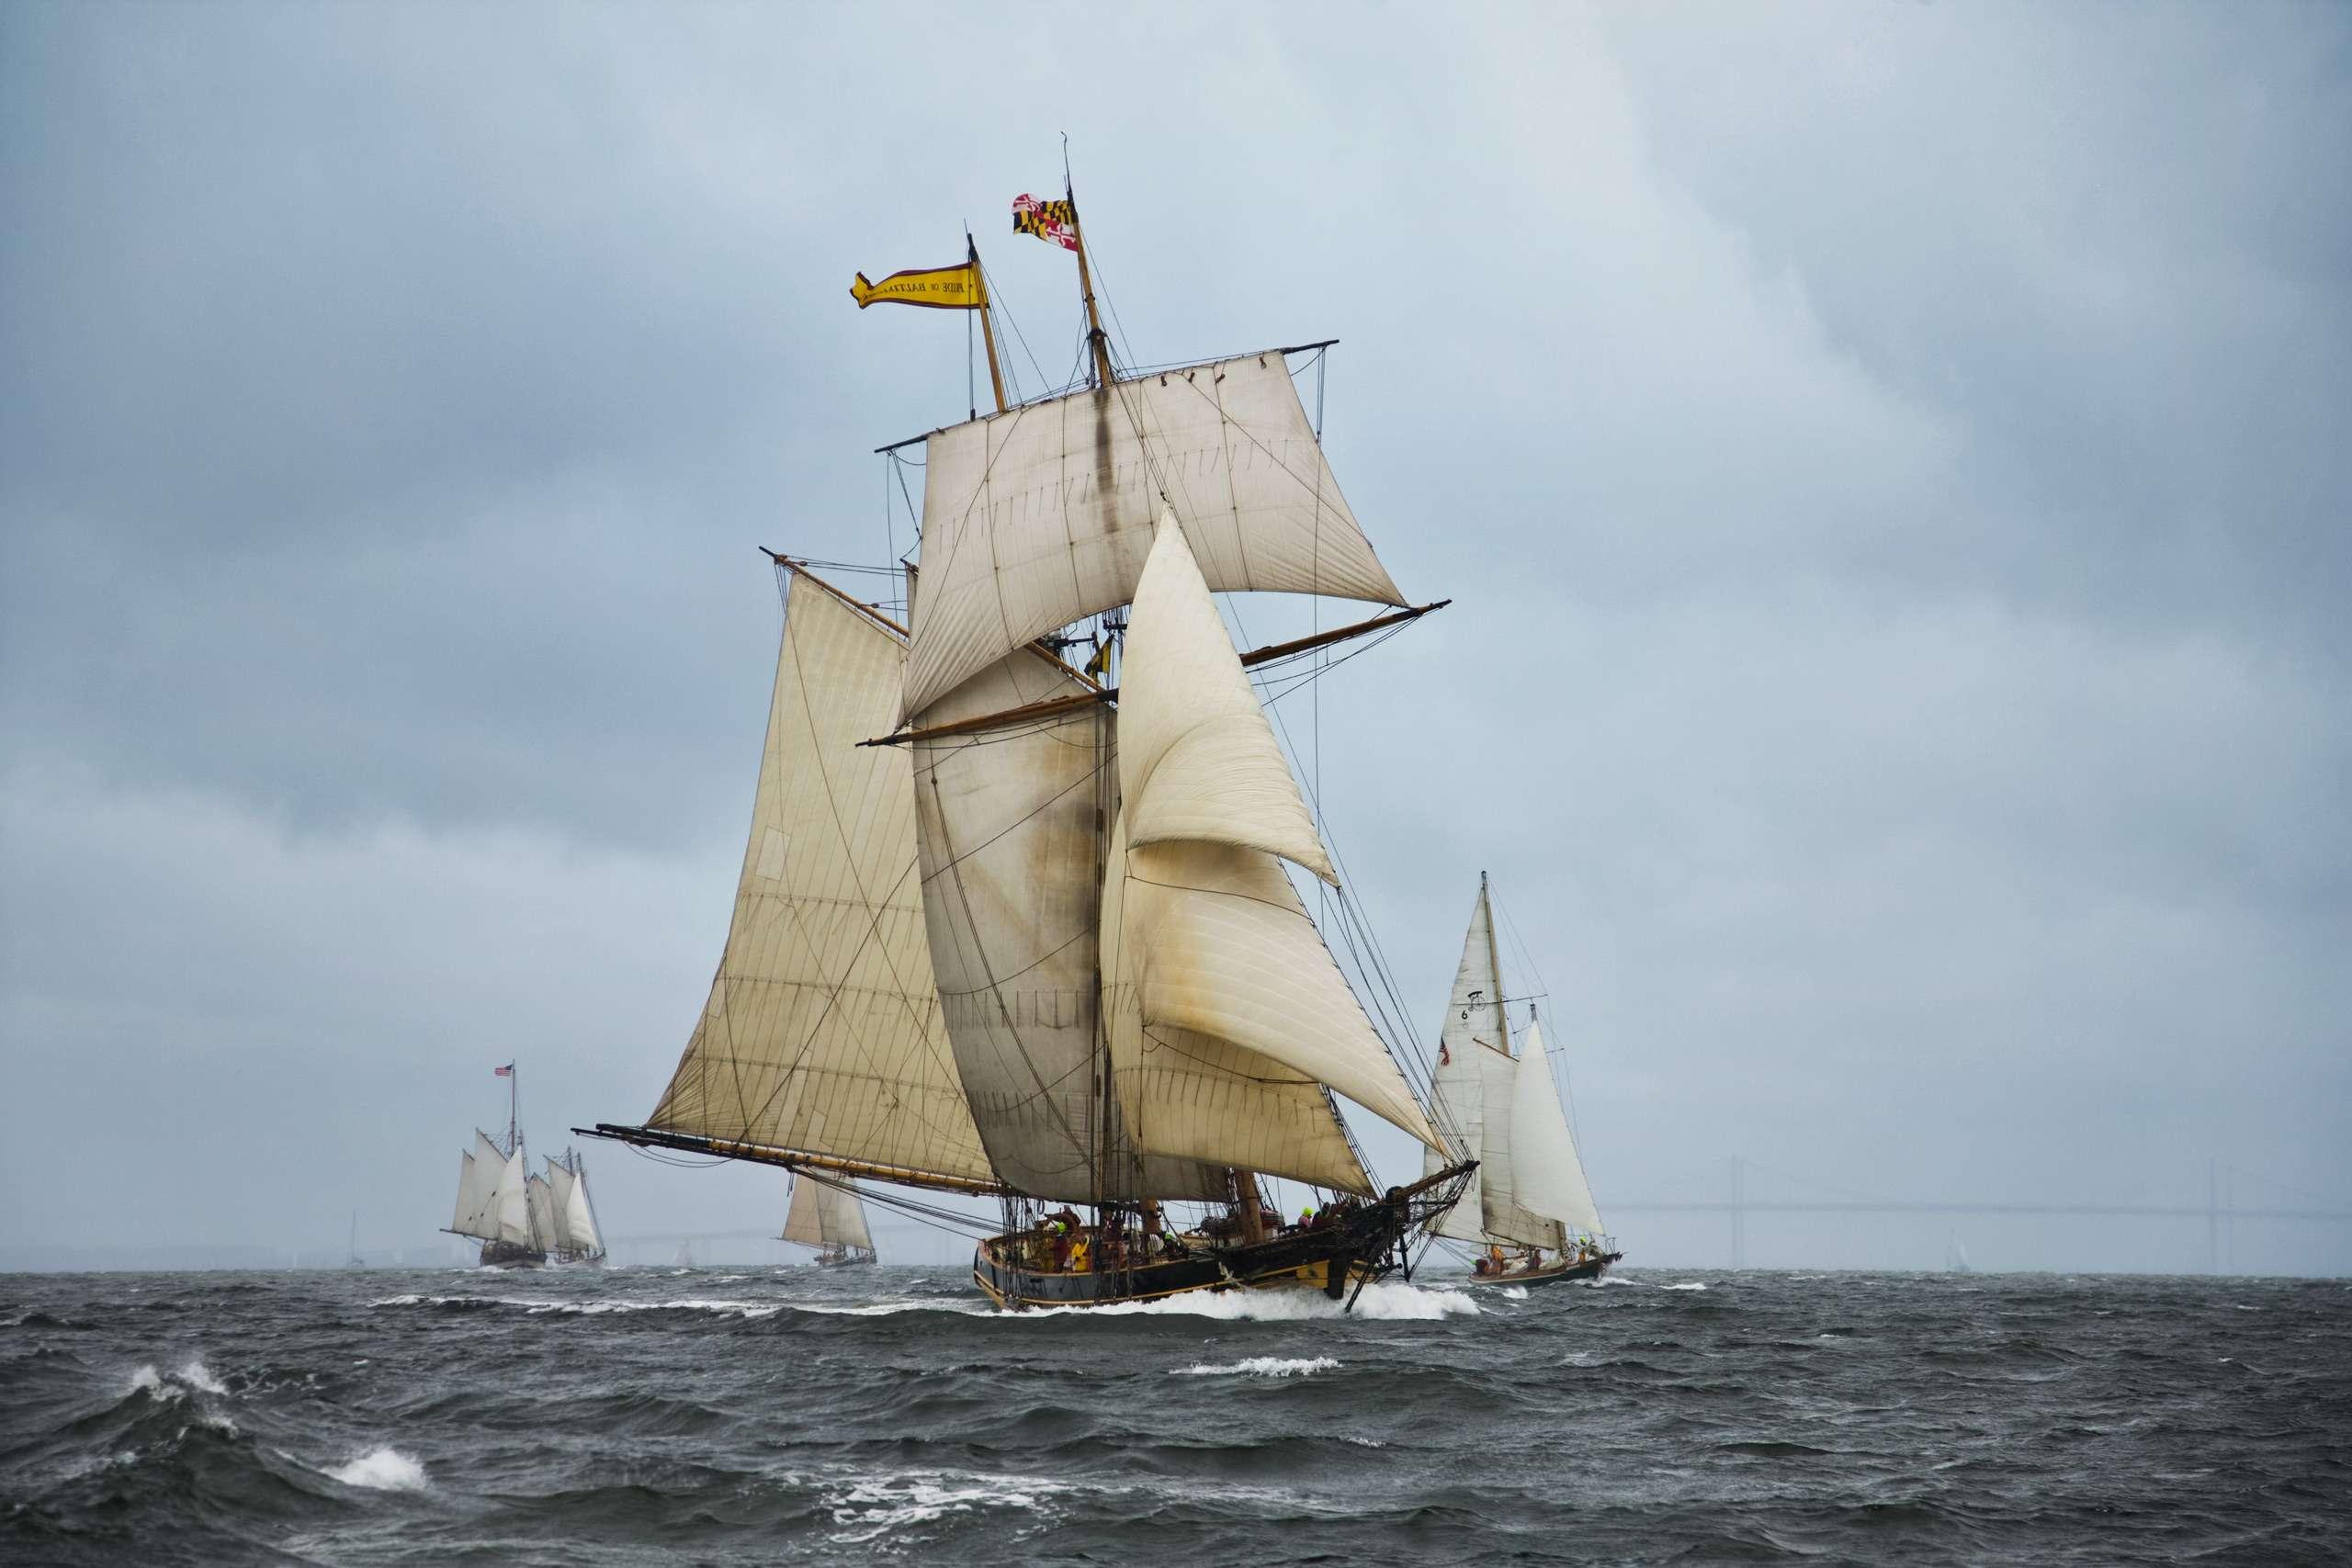 PORTFOLIO - Sailing - Tall Ships #7-PCG467